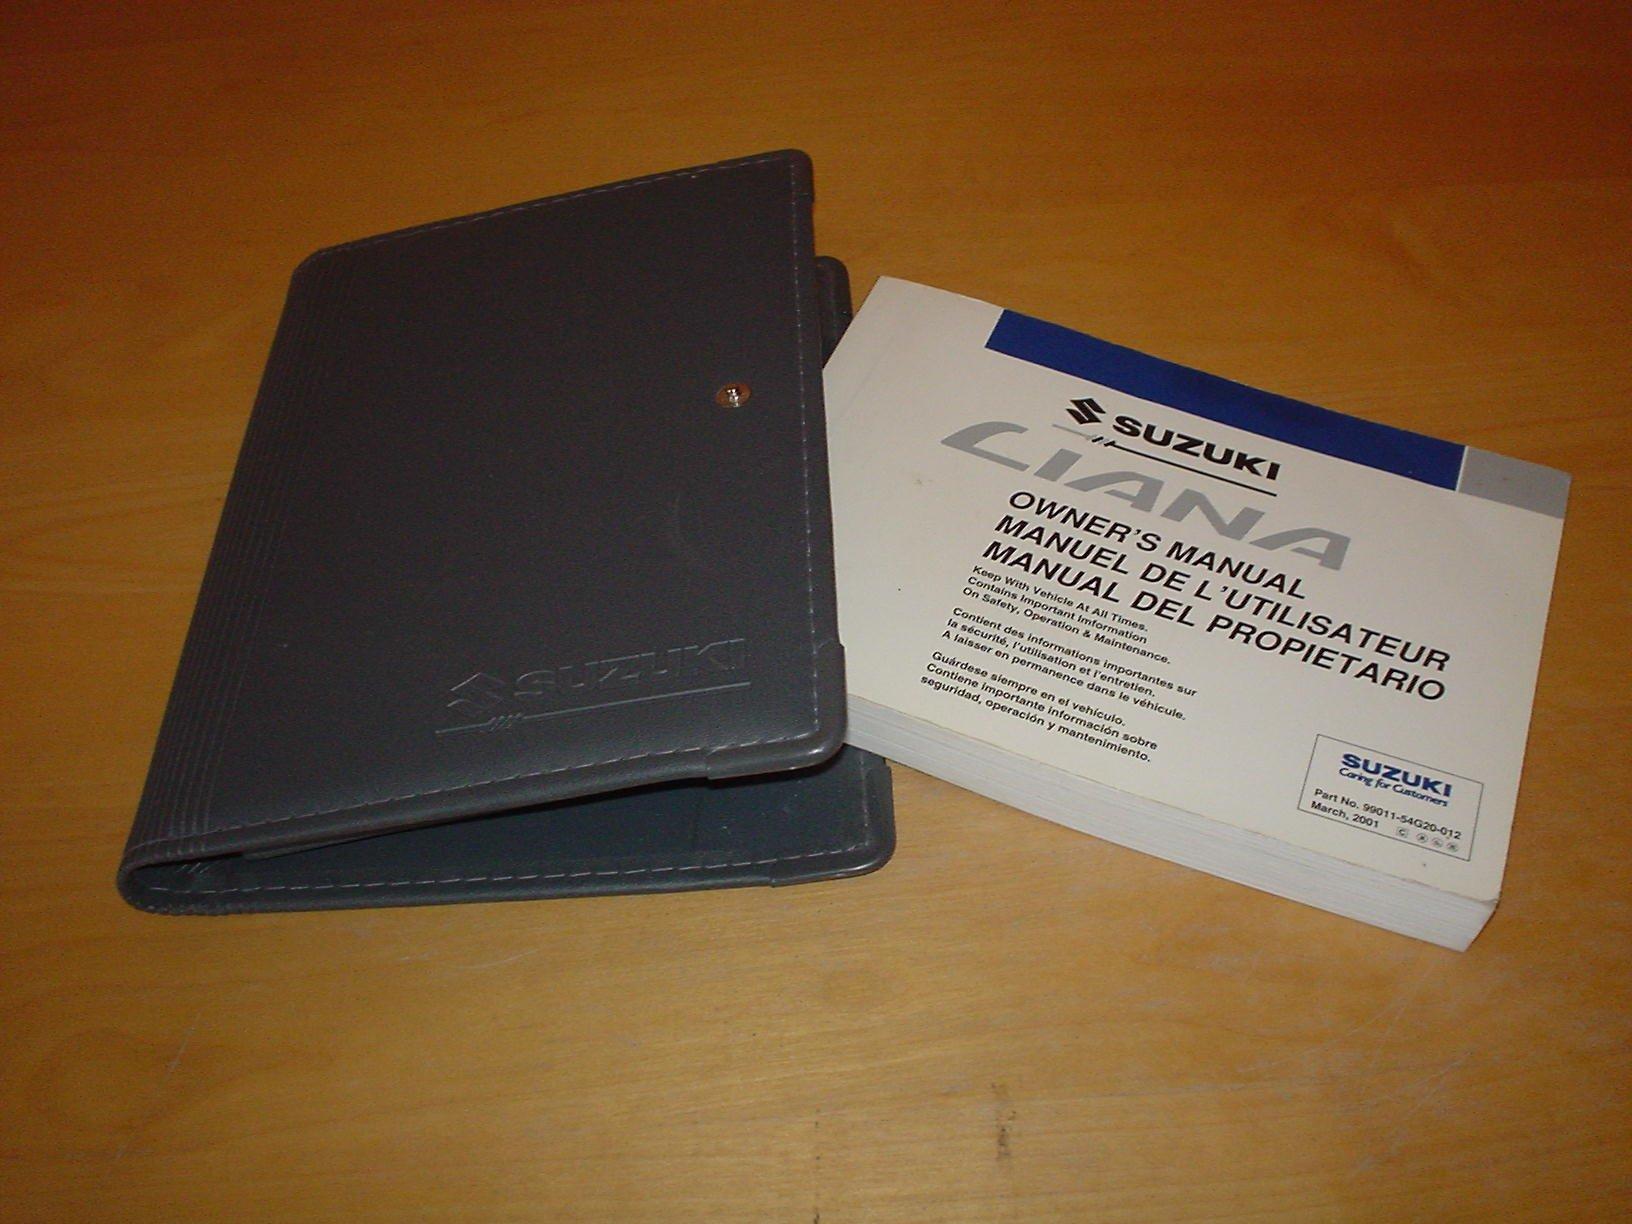 suzuki liana owners manual handbook 2001 2007 1 3 1 6 litre rh amazon co uk repair manual suzuki liana 2009 Suzuki Liana